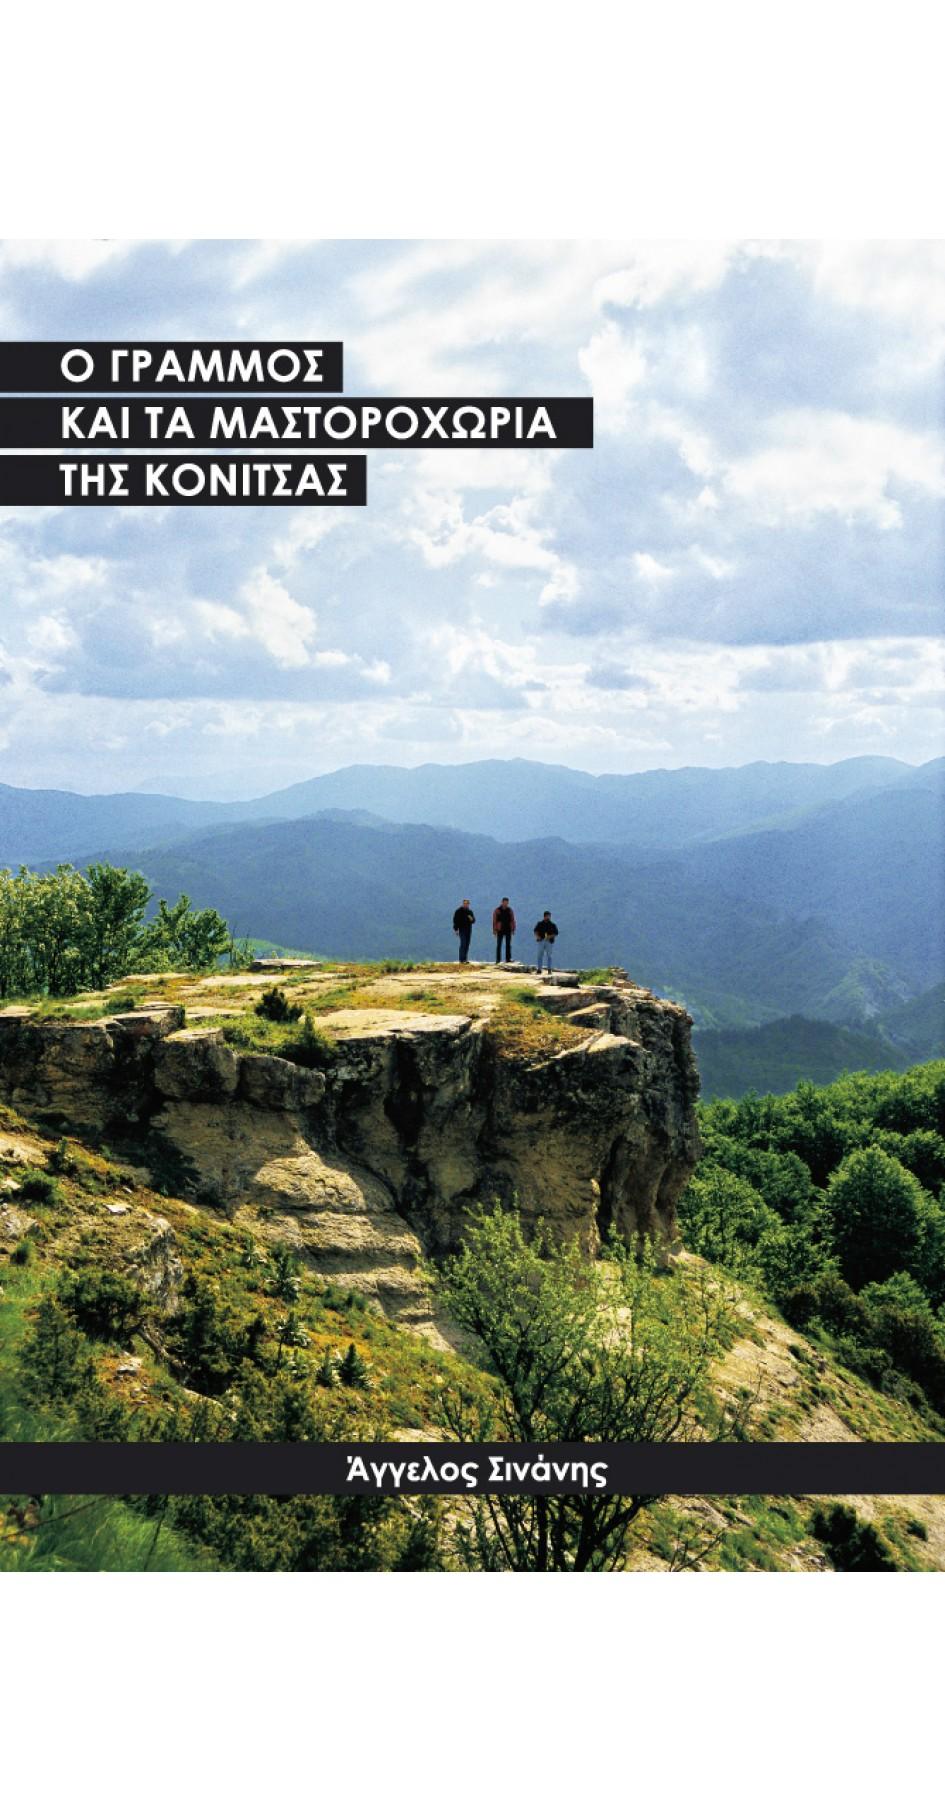 Grammos and the Mastorochoria villages of Konitsa